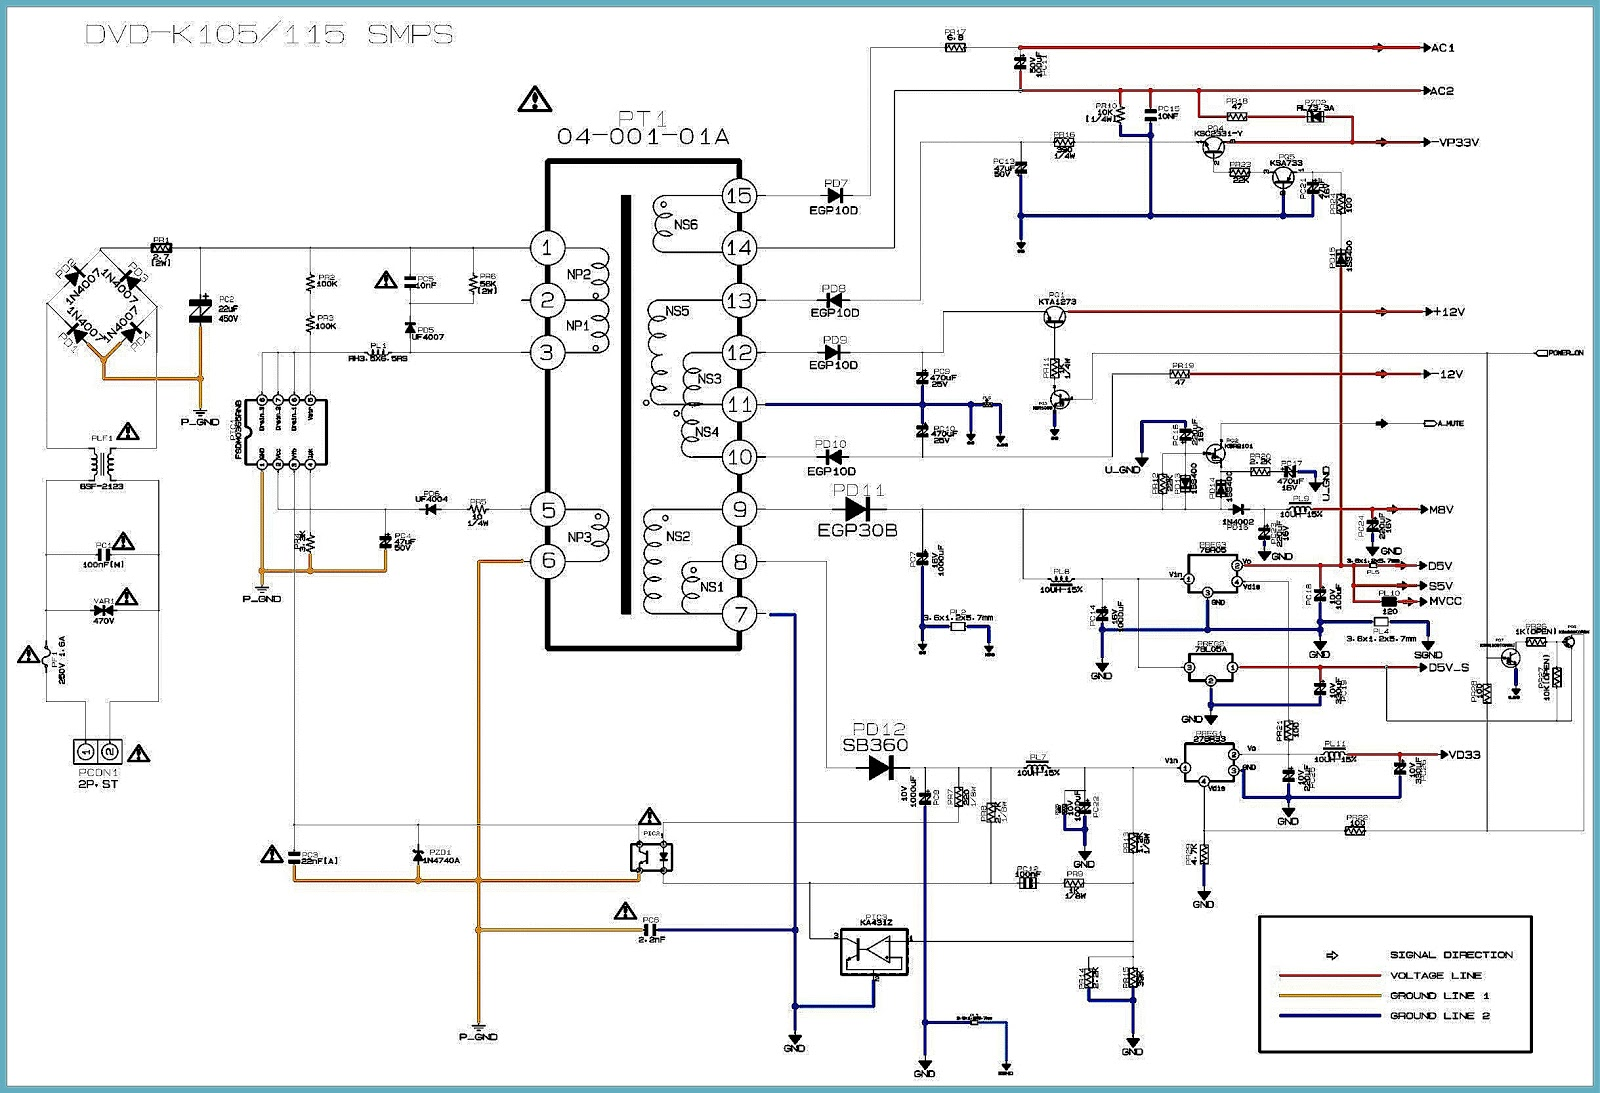 hight resolution of dvd wiring diagram wiring diagram page dvd player wiring block dvd circuit diagrams